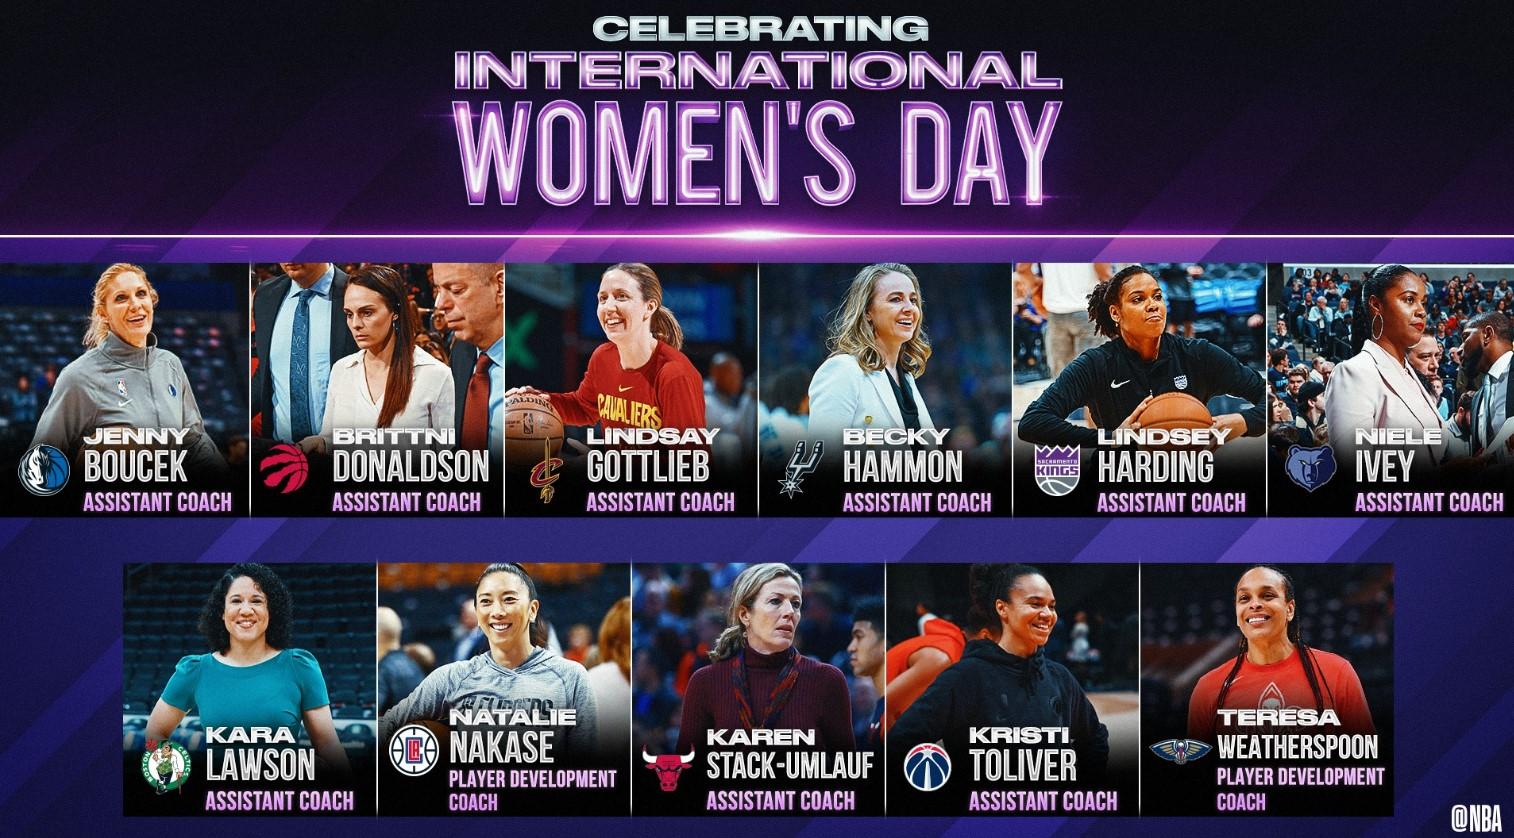 NBA官方推特列举11位女性助教,并祝广大女性节日快乐